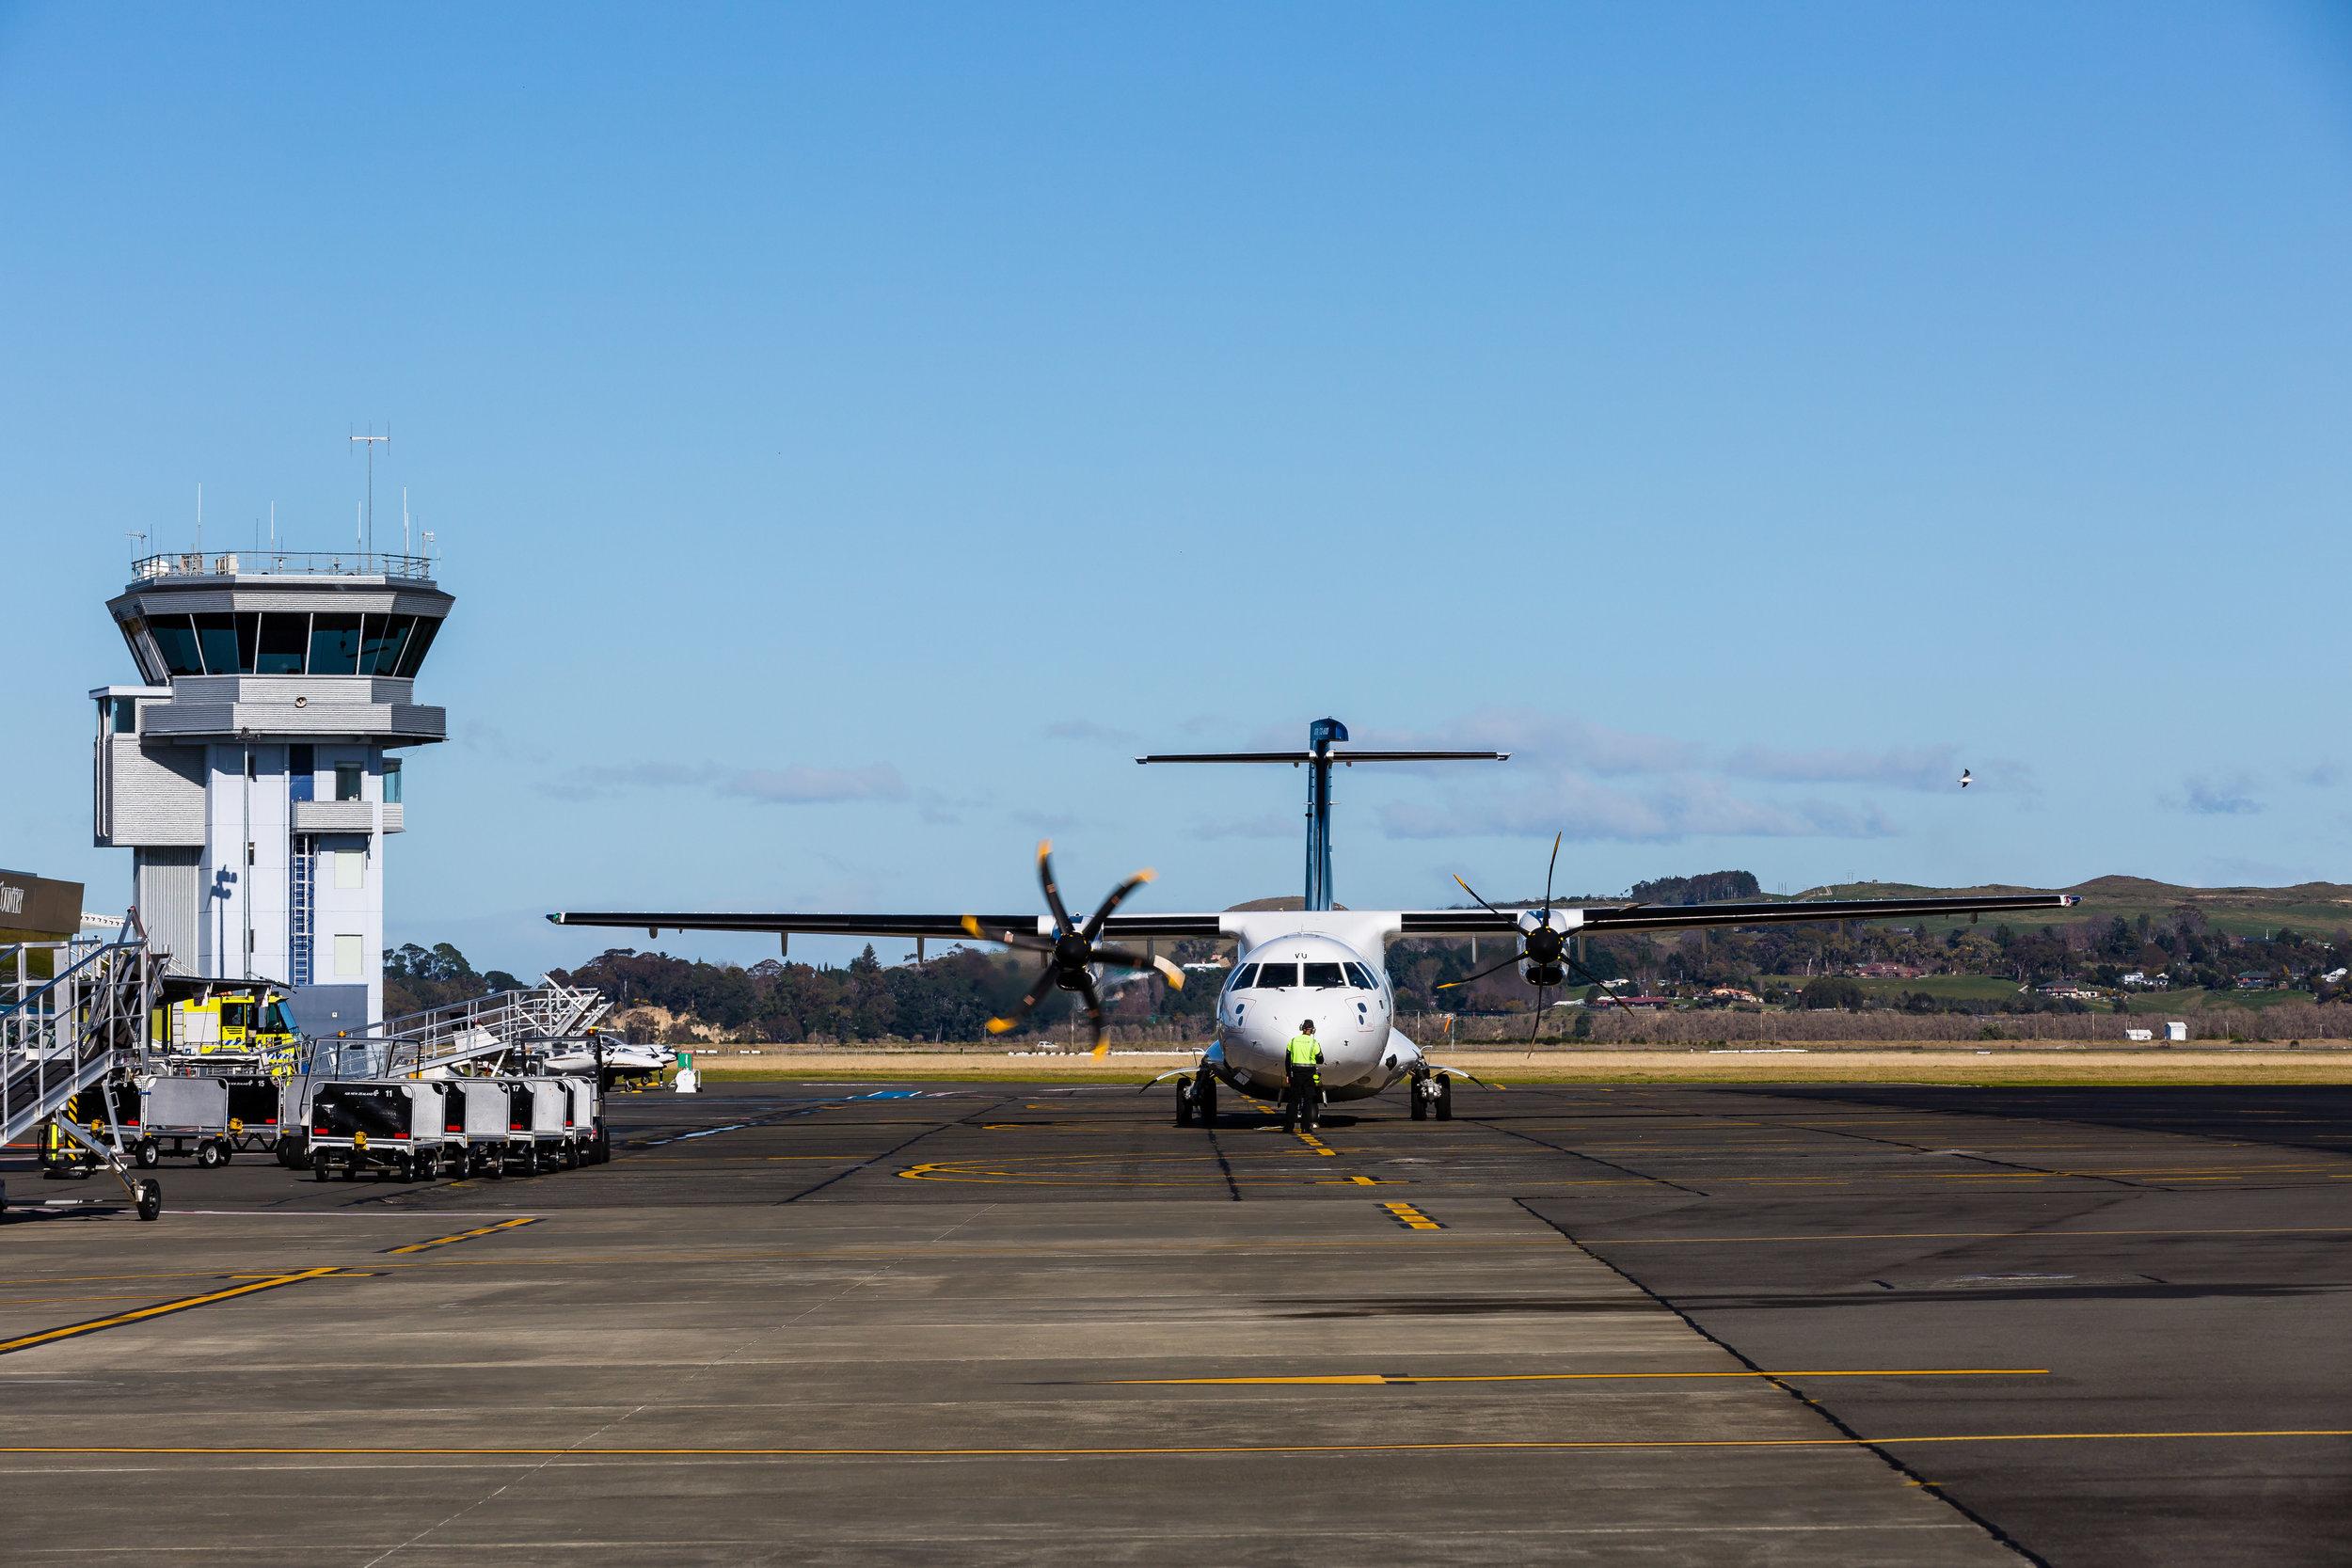 Air New Zealand aircraft arriving at the terminal